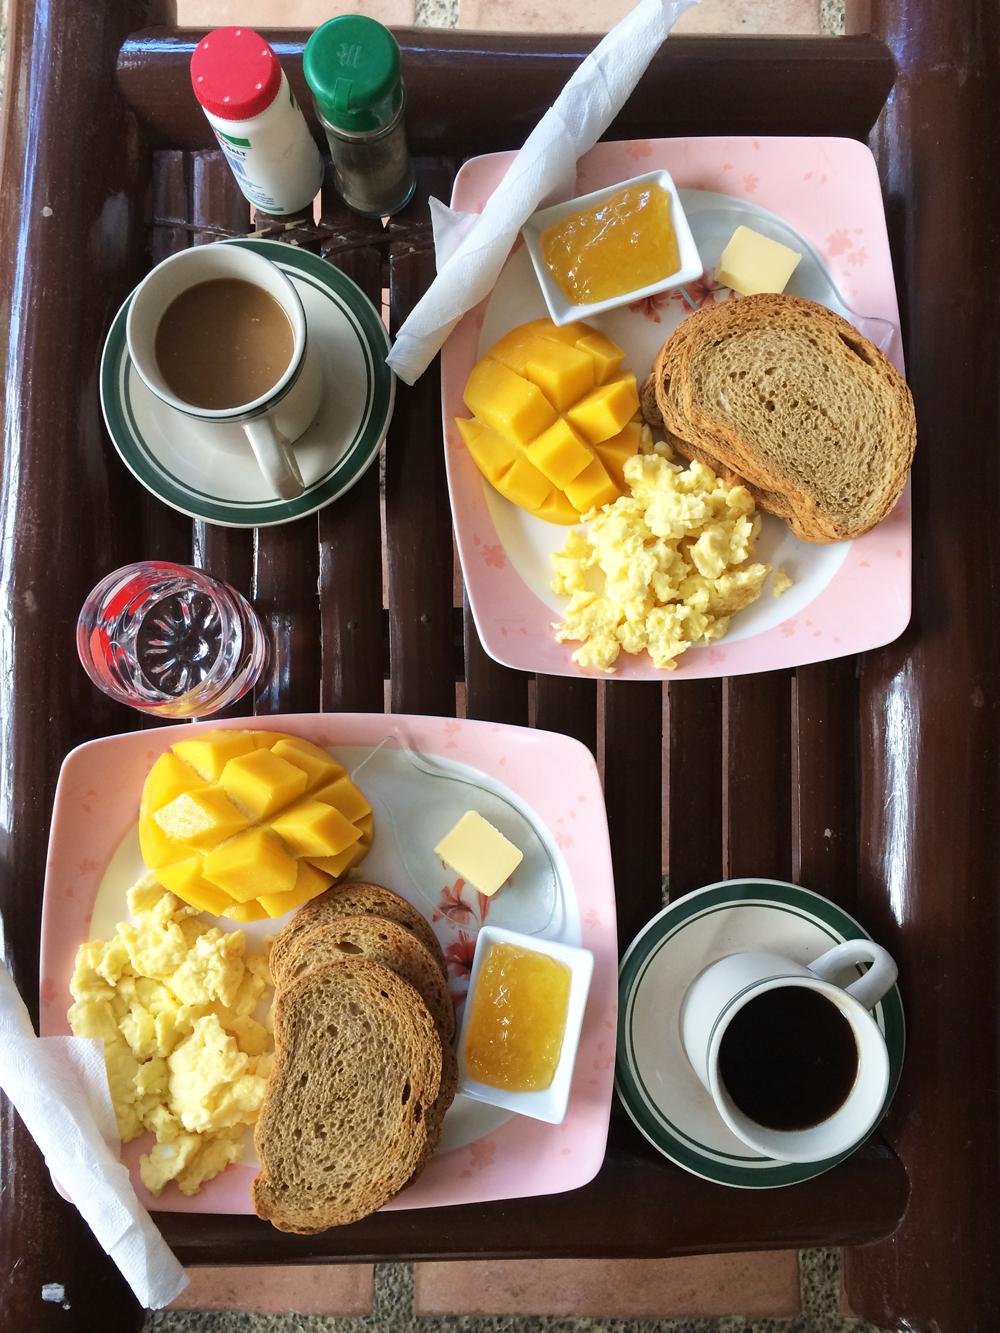 Breakfast at Greenyard Inn